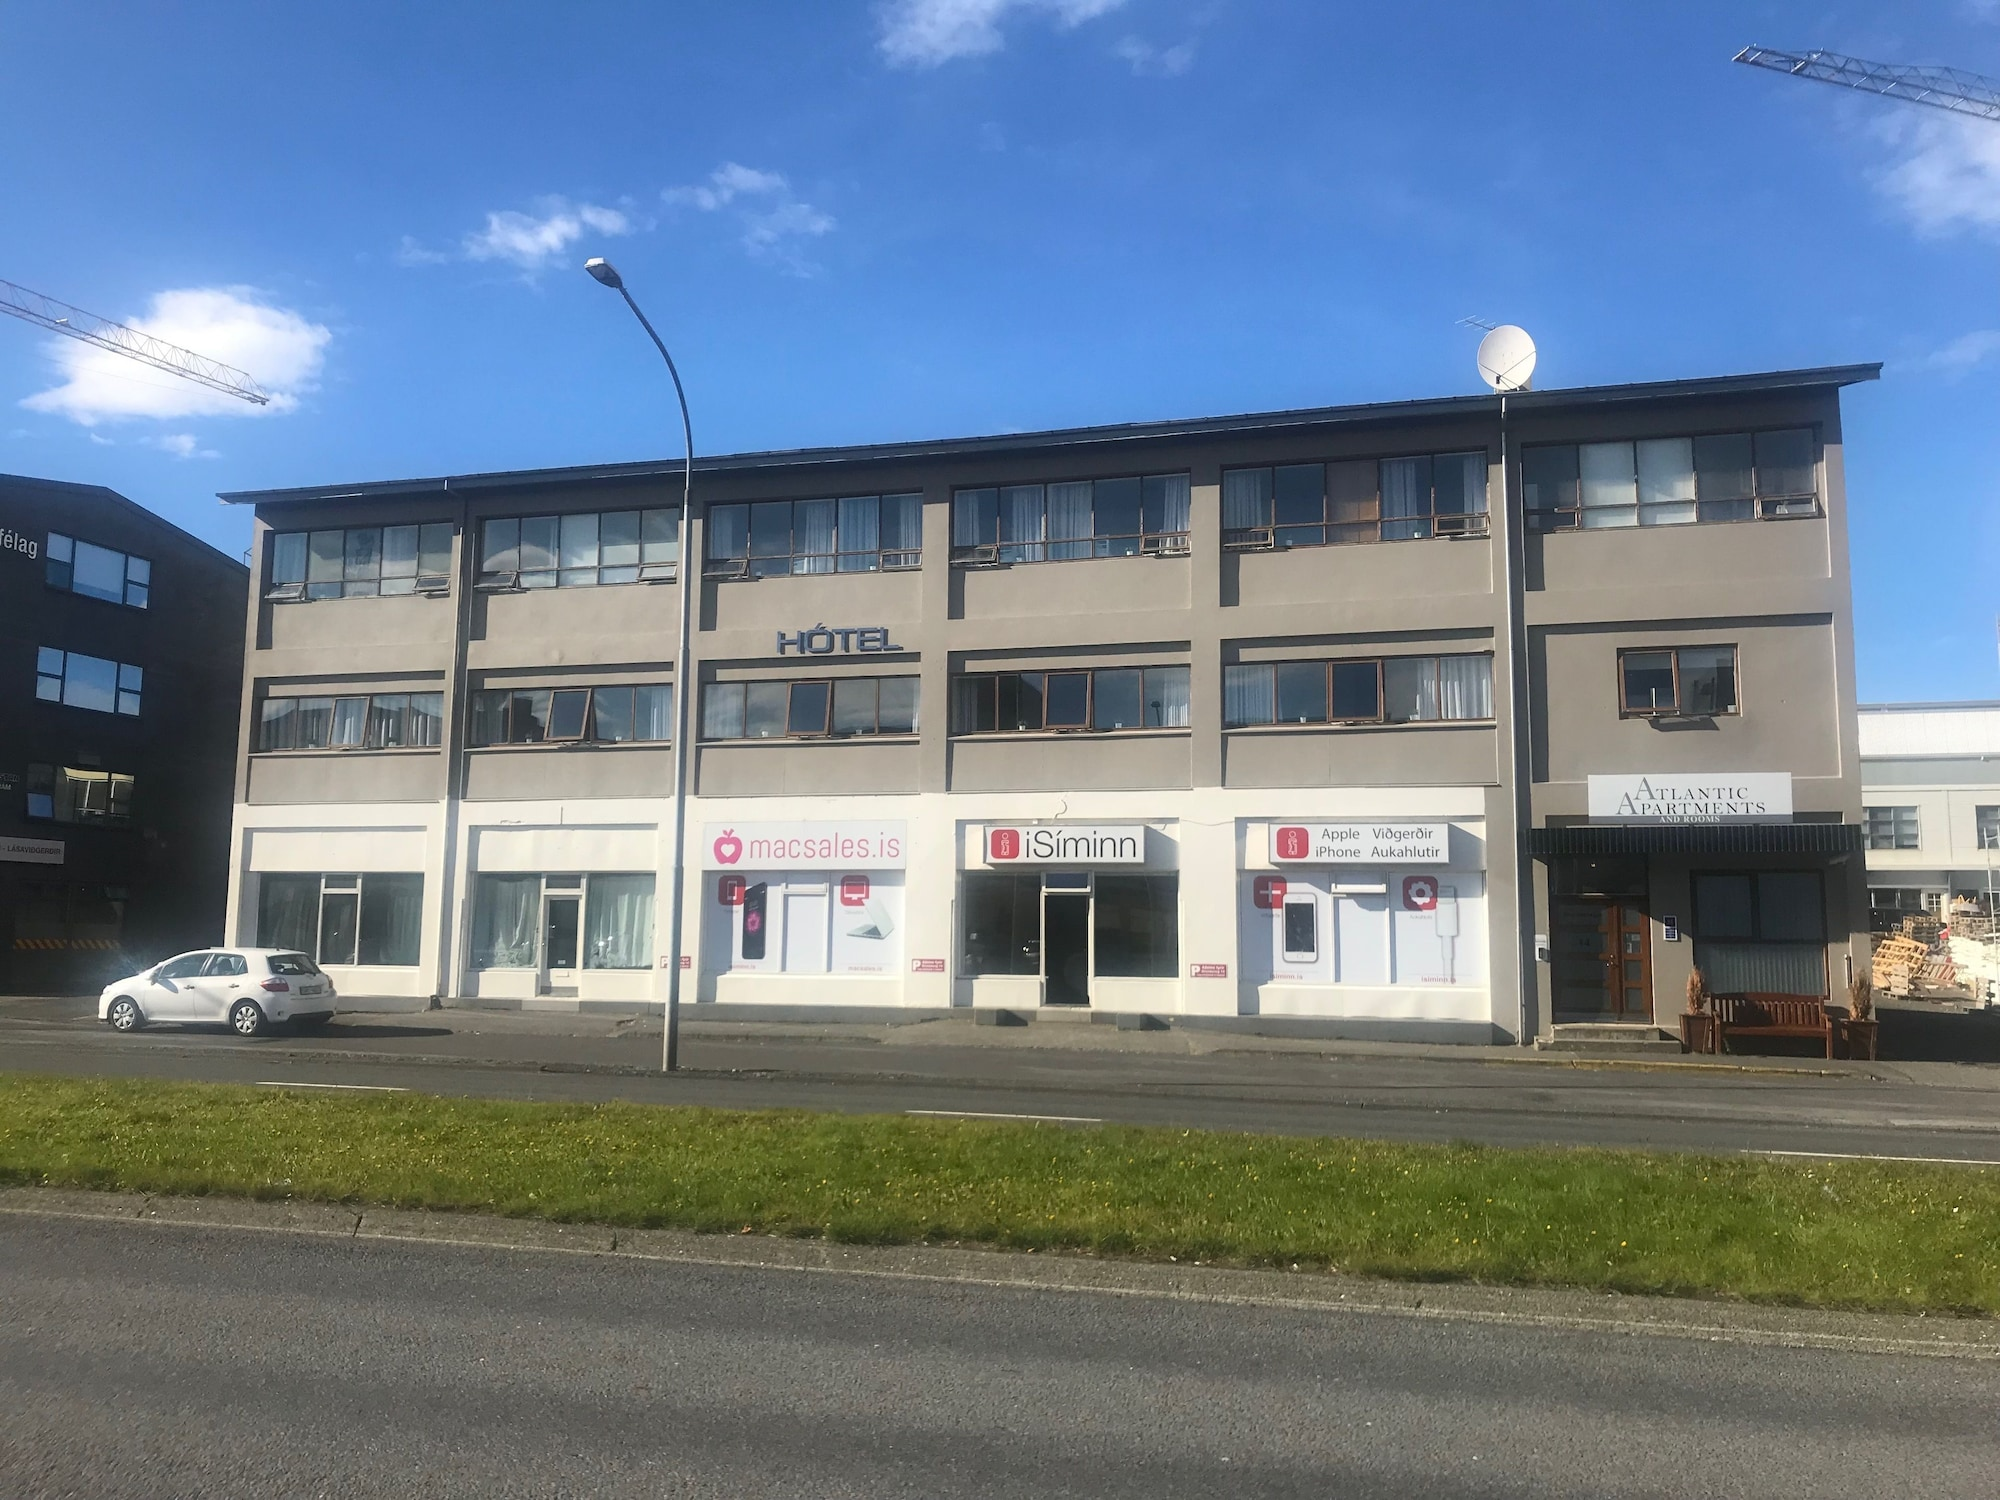 Atlantic Apartments and Rooms, Reykjavík